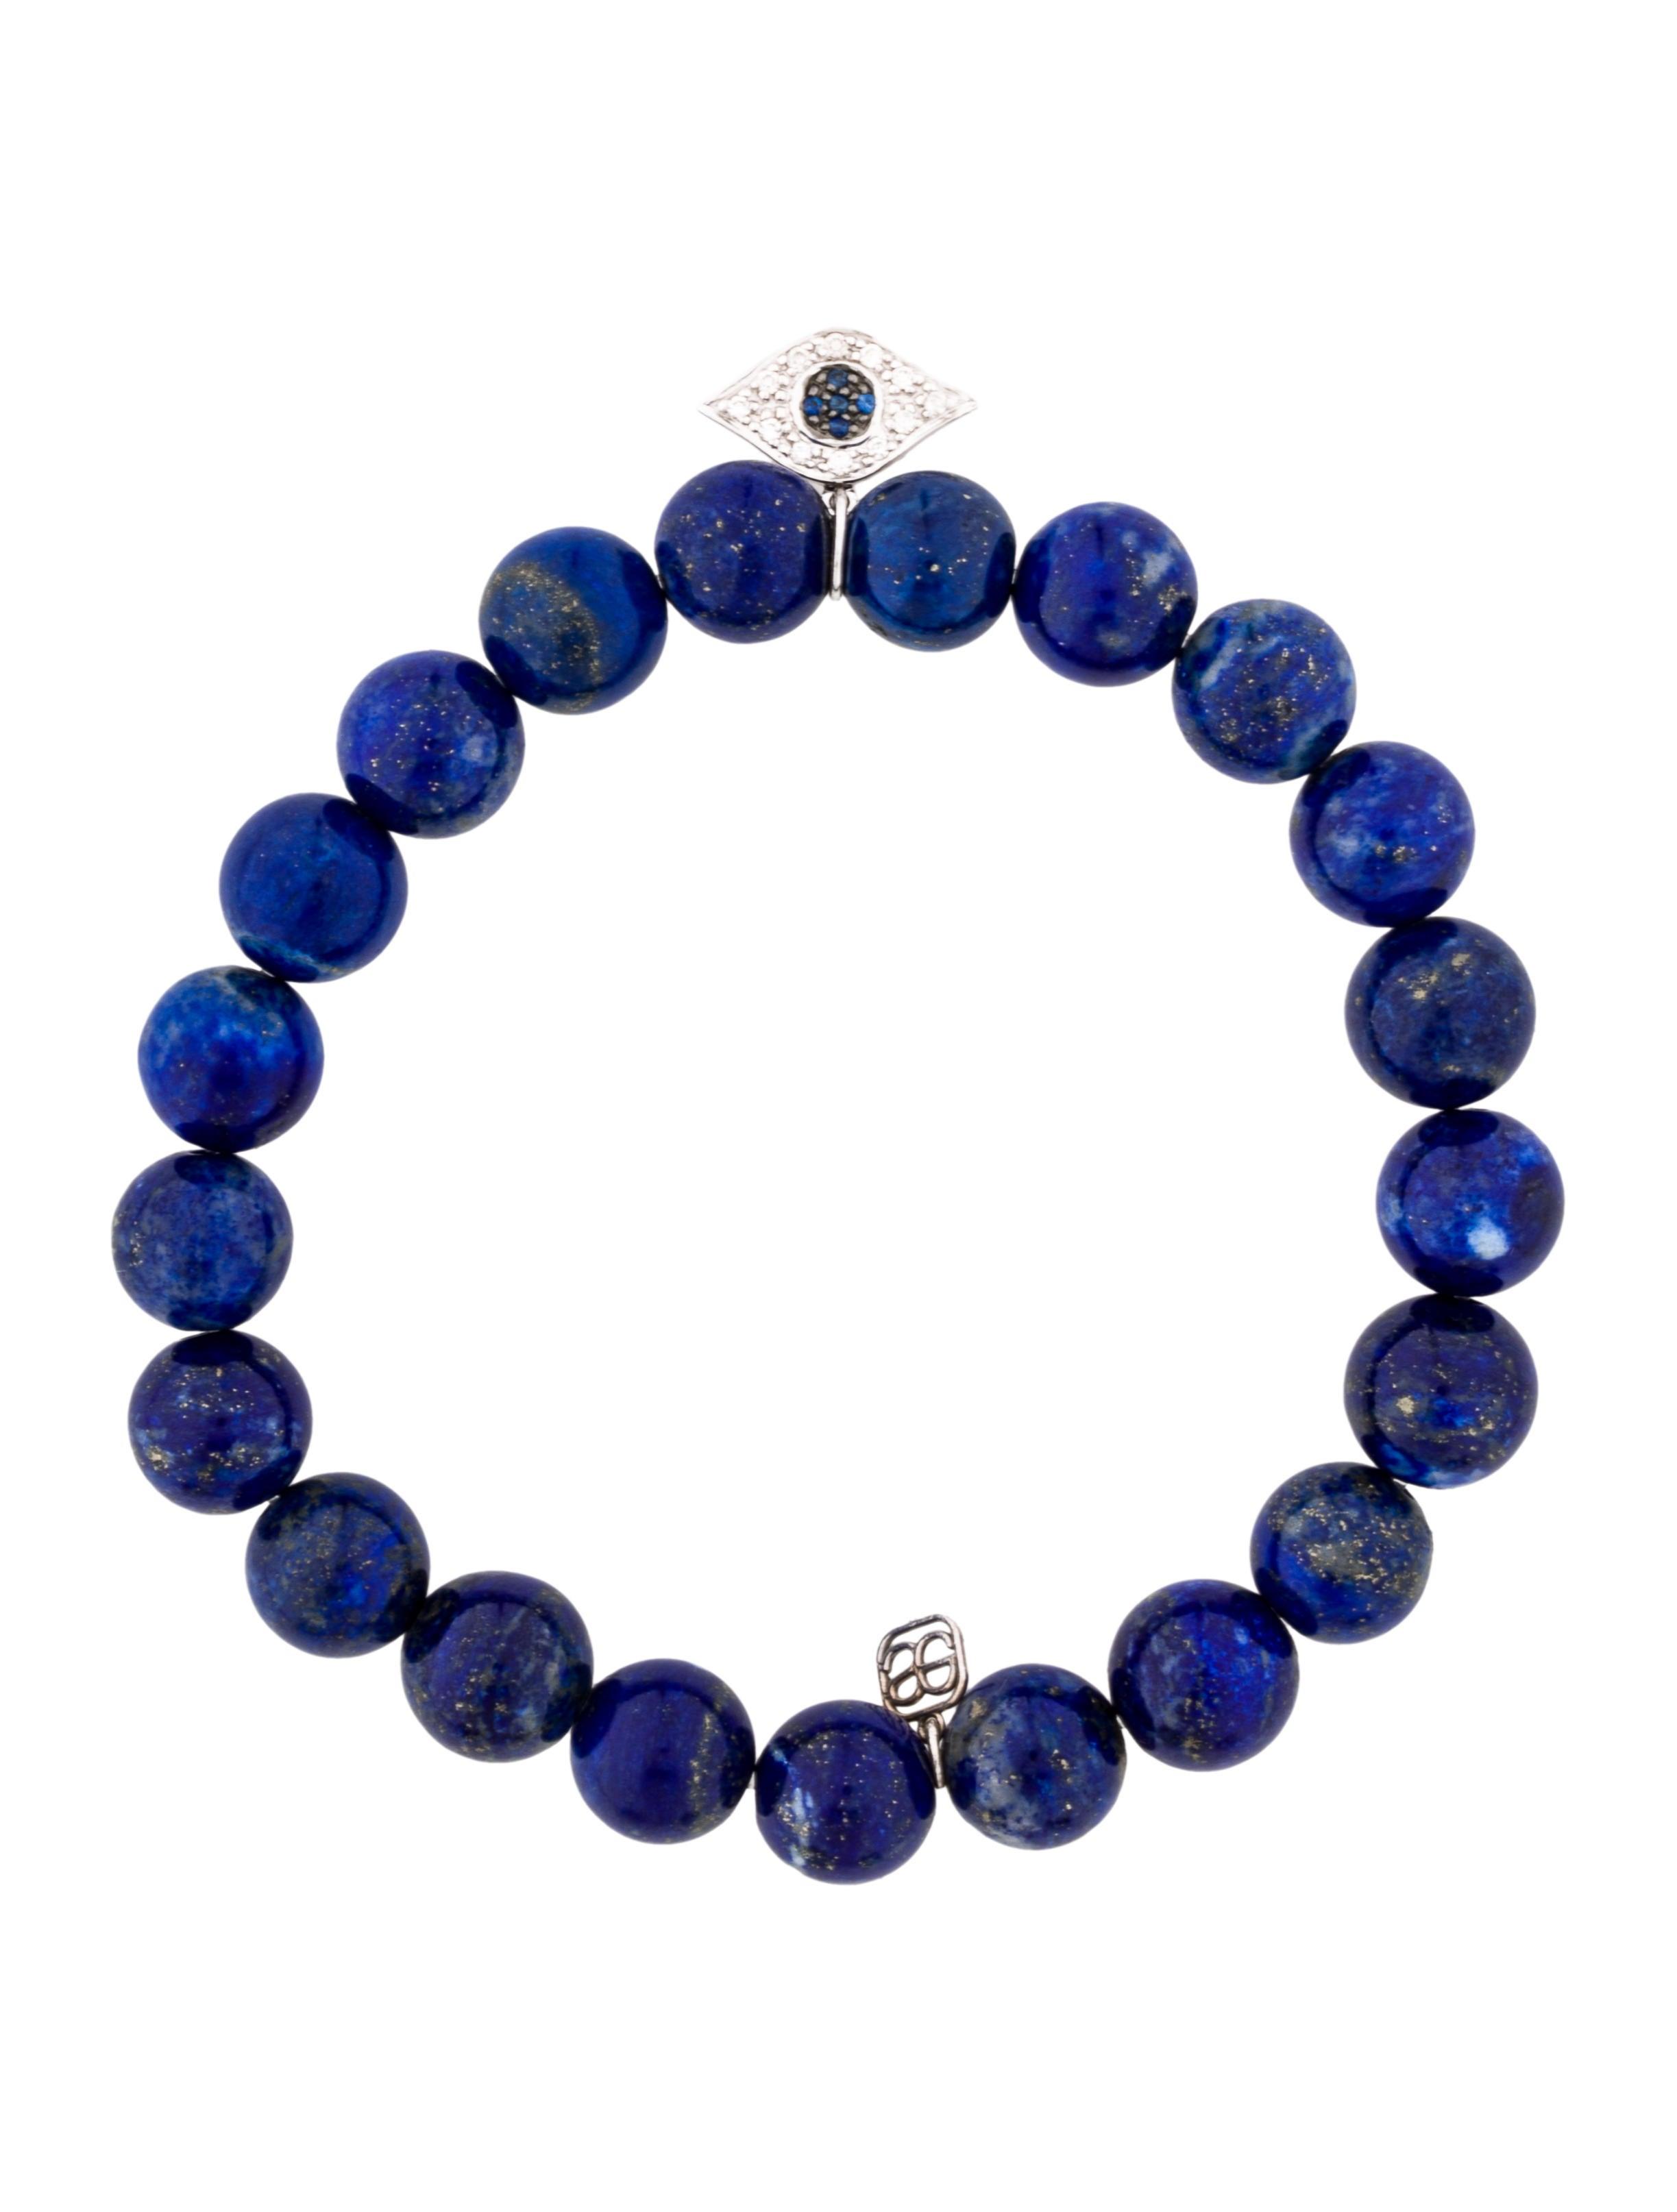 sydney evan diamond sapphire evil eye lapis lazuli bead bracelet bracelets sye20542. Black Bedroom Furniture Sets. Home Design Ideas